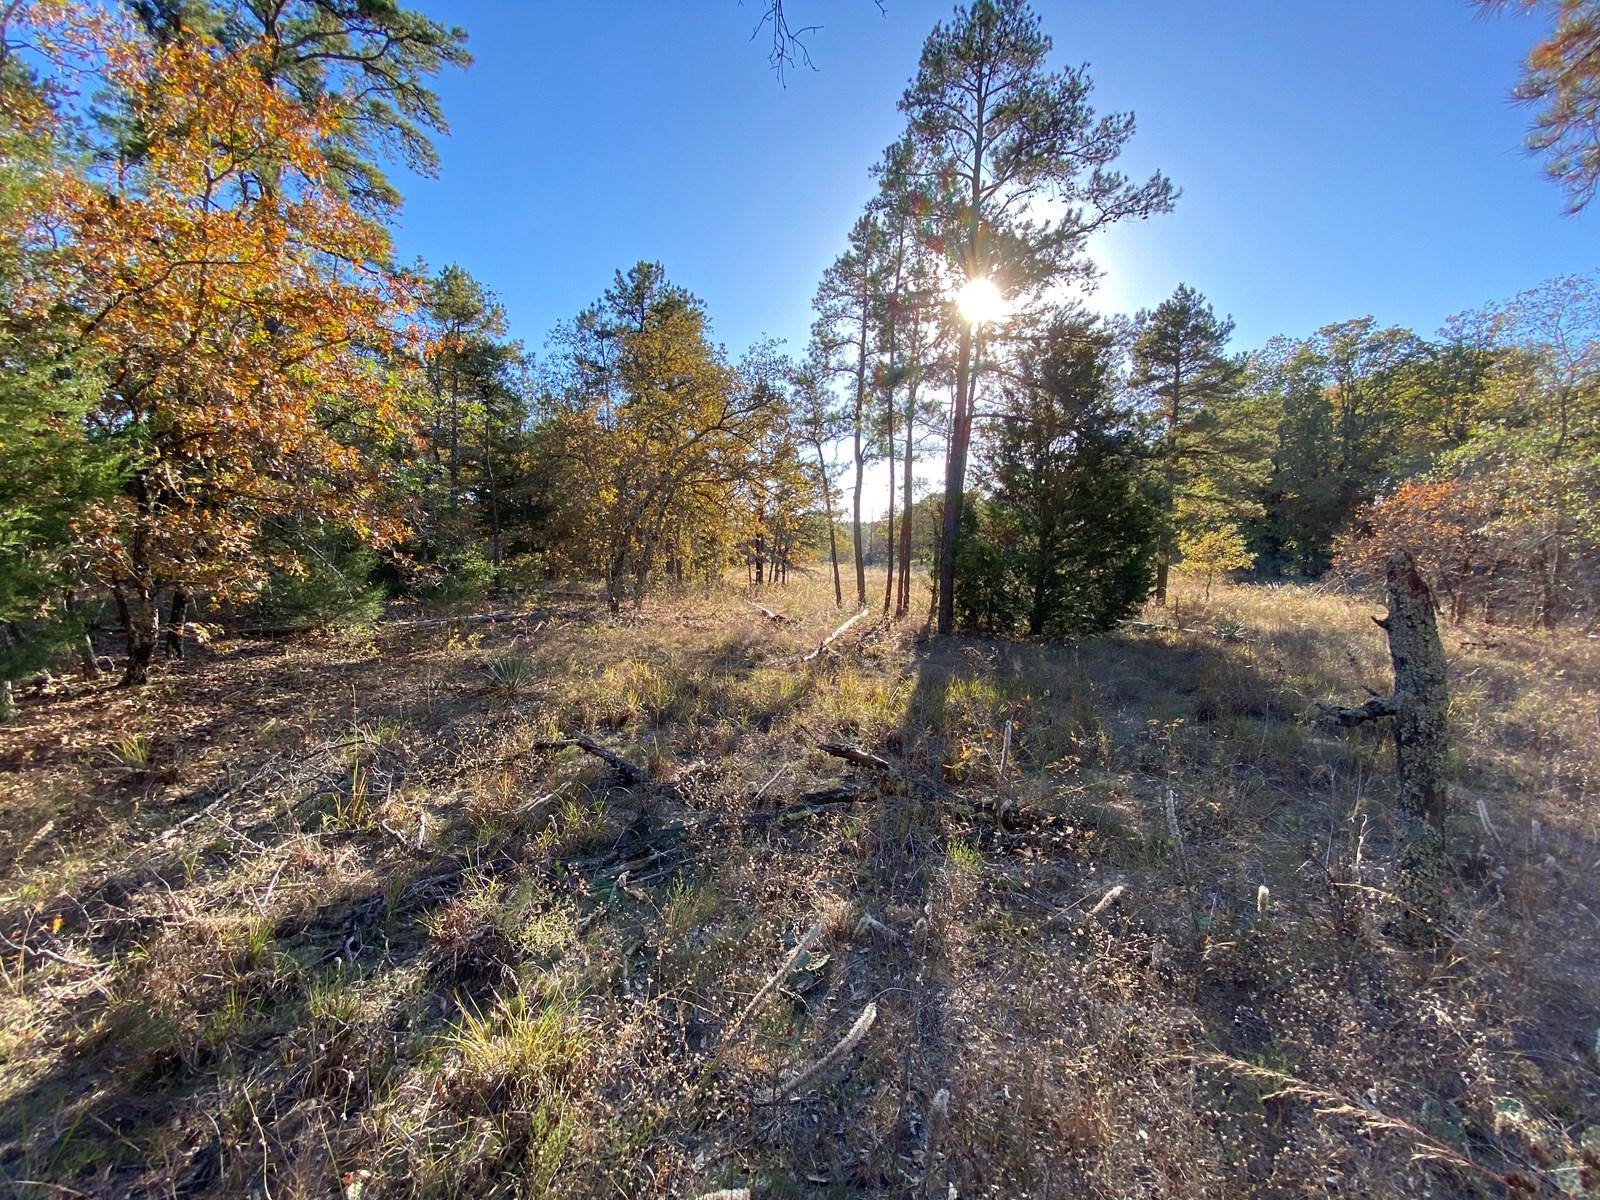 East Texas Land for Sale in Wood County Near Hawkins Texas